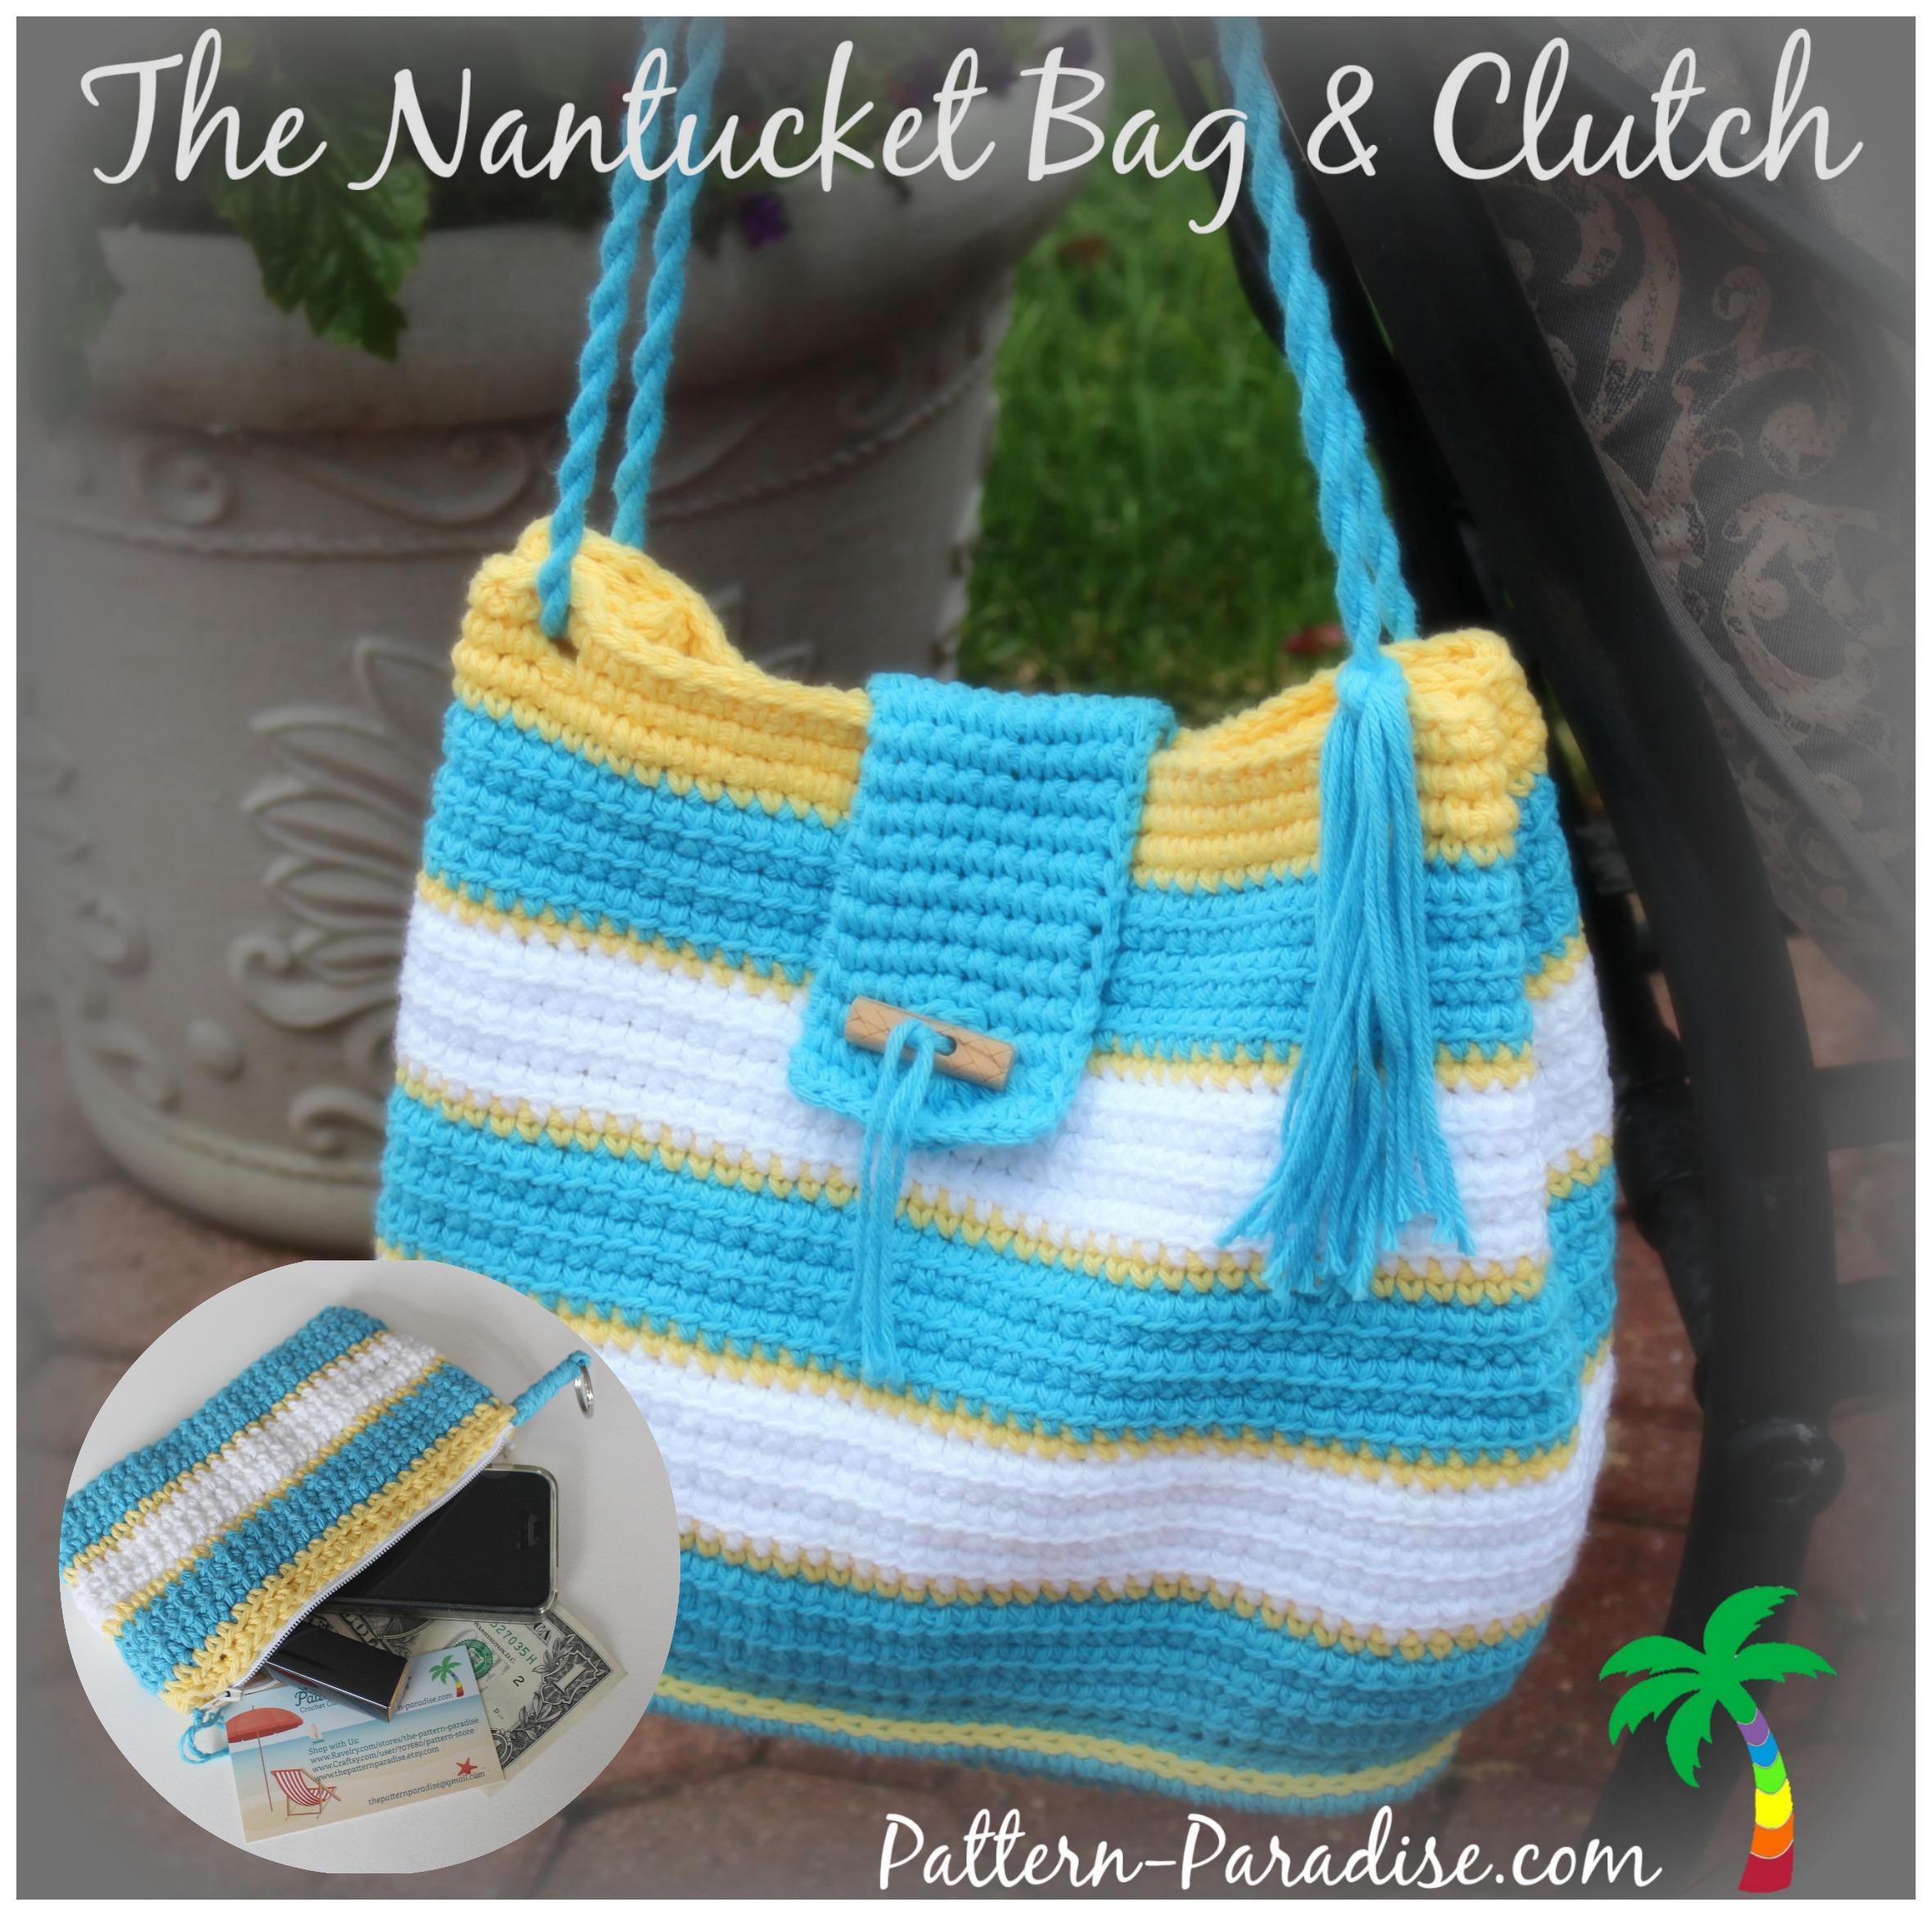 New Crochet Purse Patterns : NEW Crochet Pattern - The Nantucket Bag - Pattern Paradise